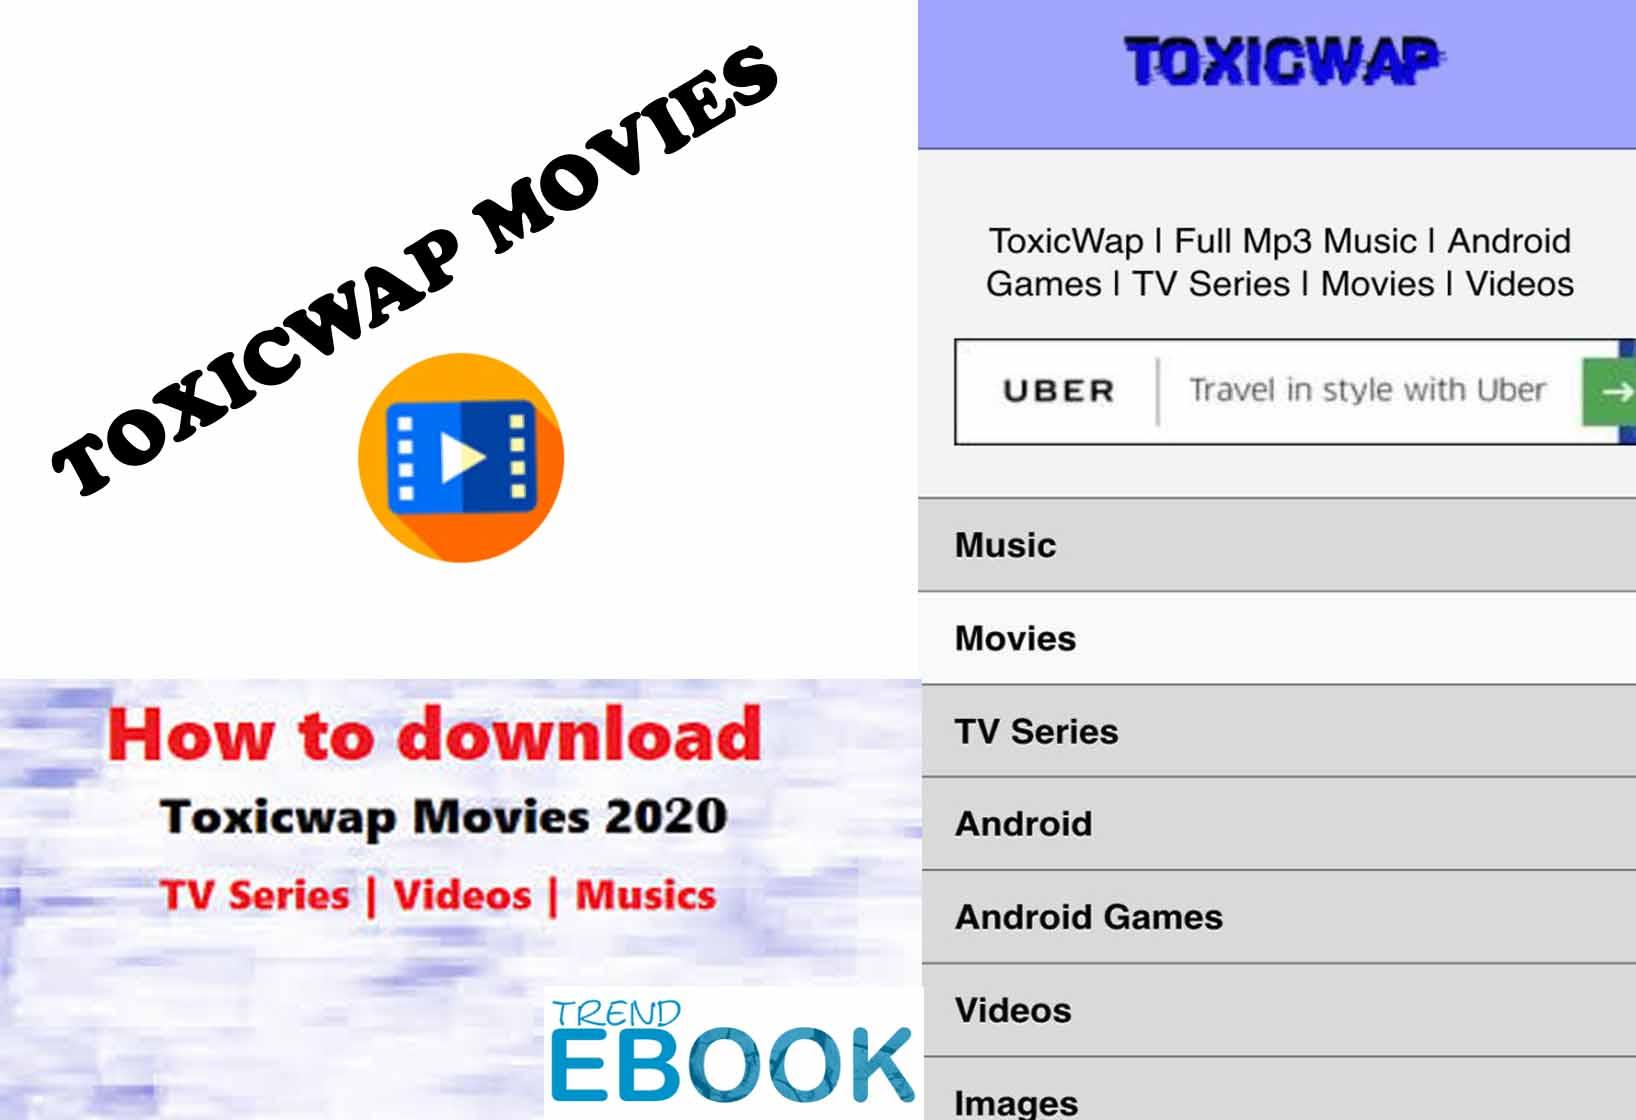 Toxicwap Movies Series - Download Latest Movies & TV Series | Toxicwap.com